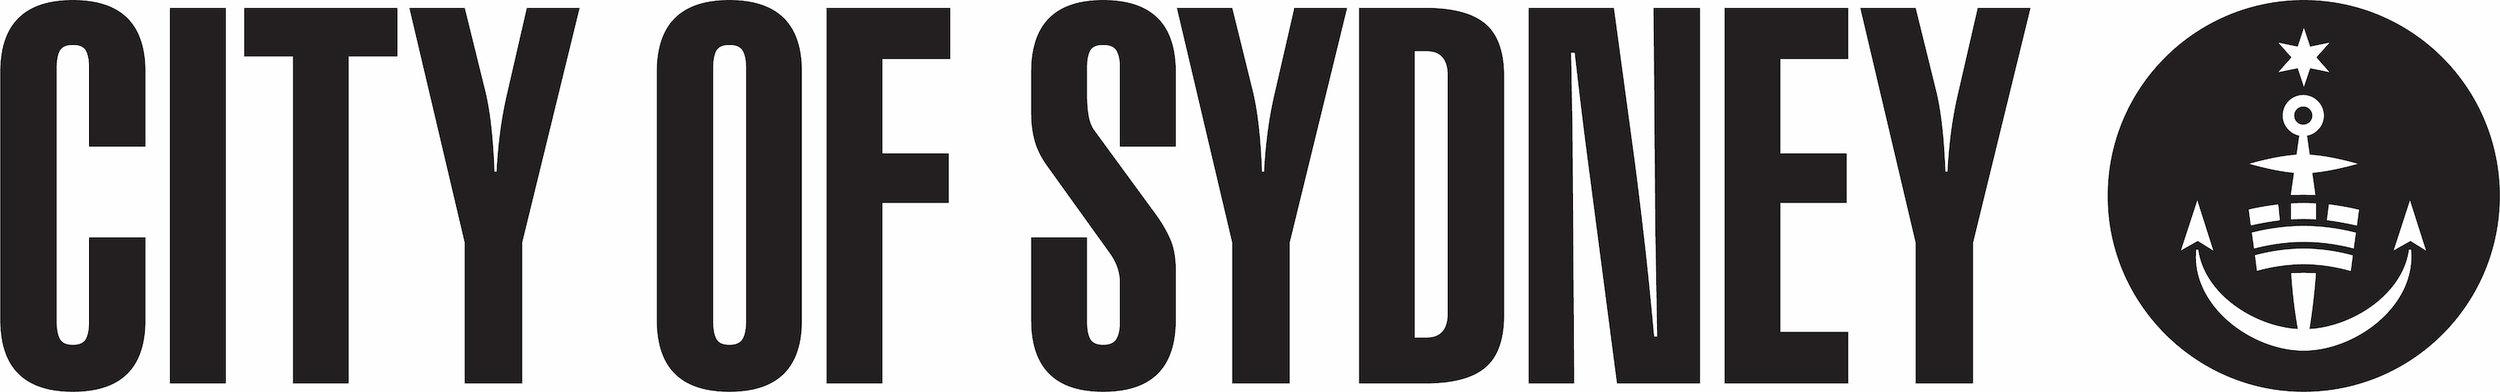 CoS_CMYK_LOCKED UP_STANDARD_BLACK.jpg